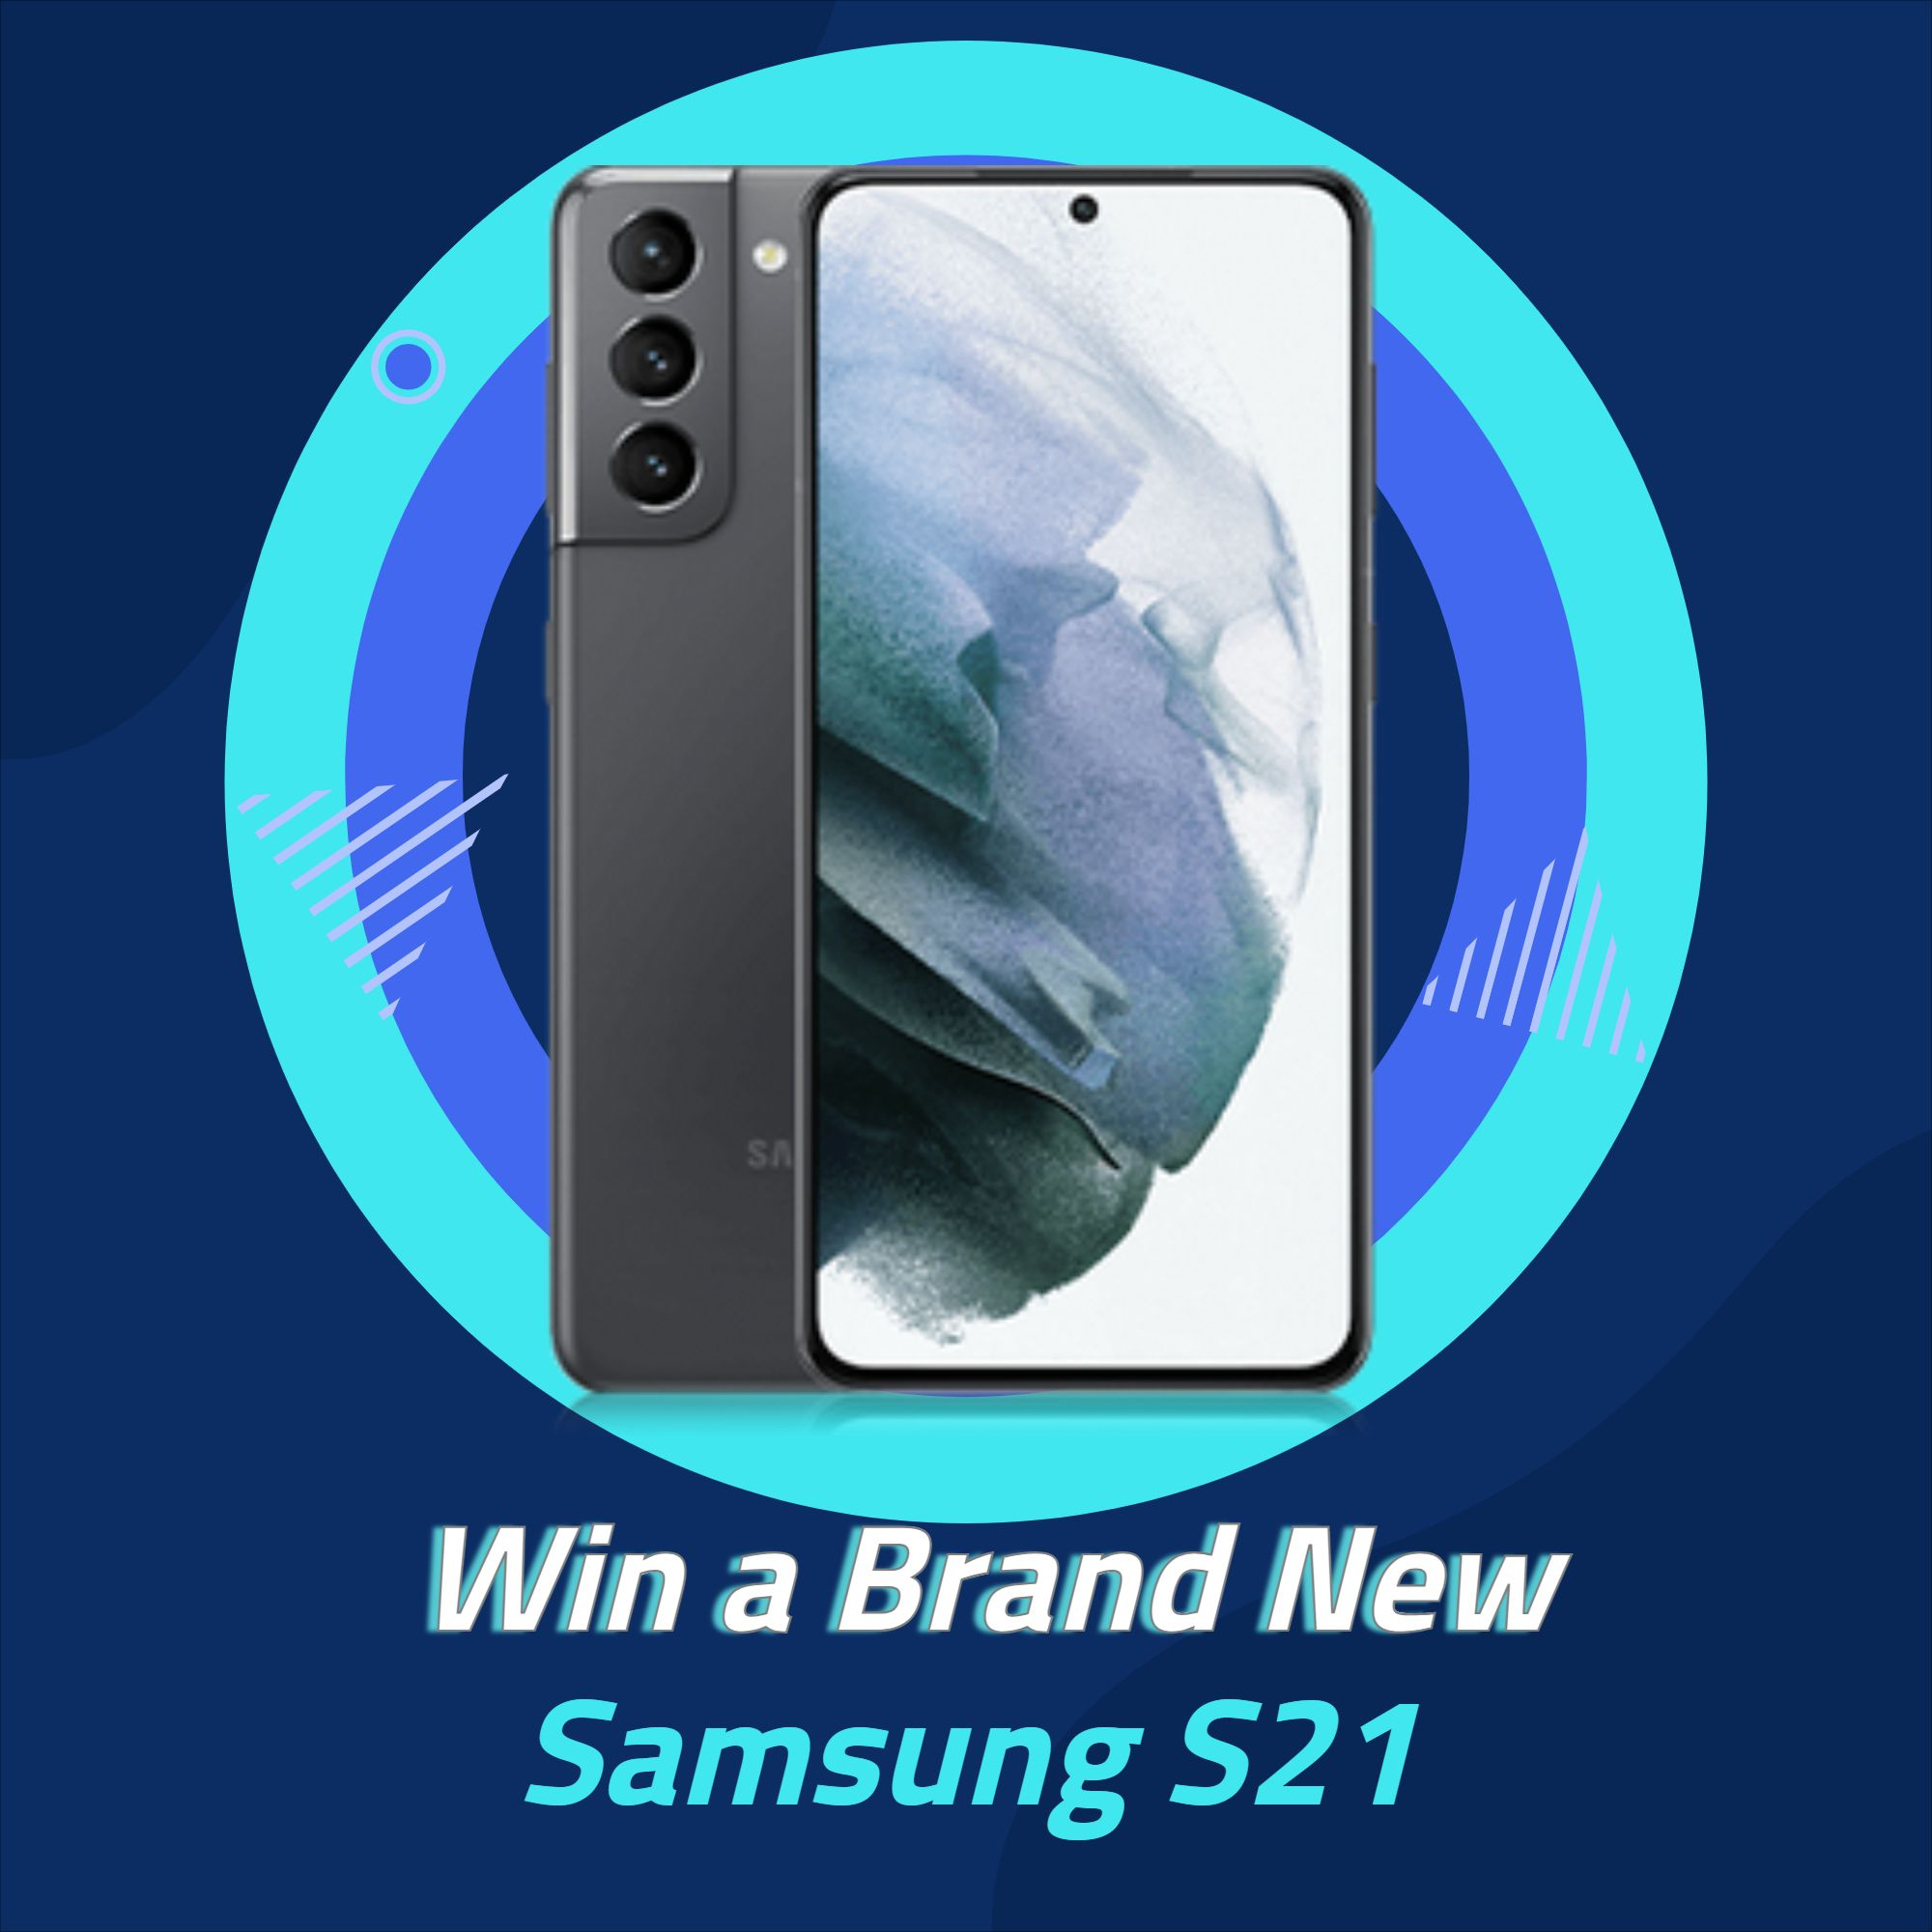 Win the Samsung S21